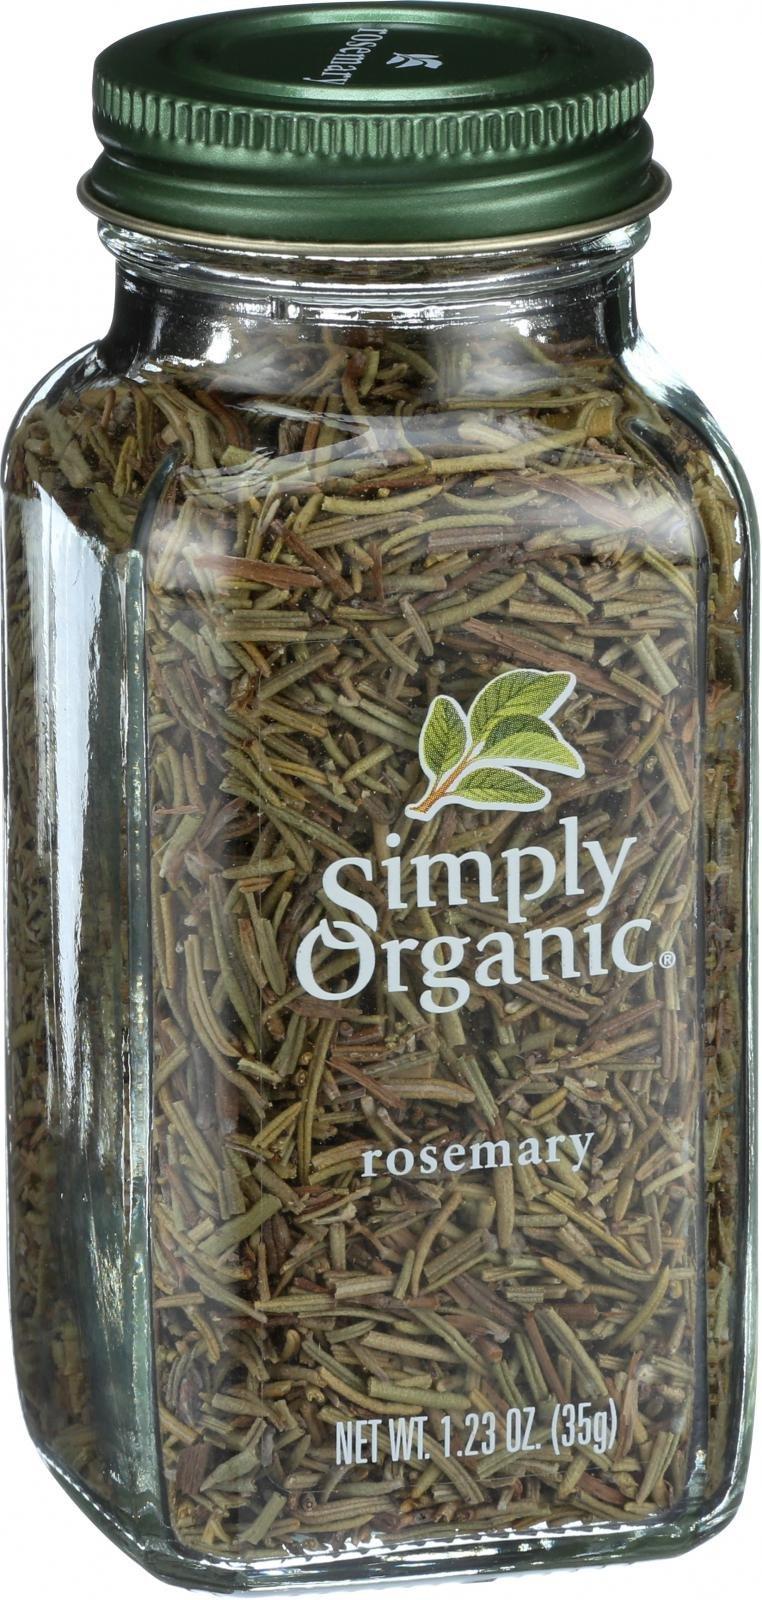 Simply Organic Rosemary Leaf- Organic - Whole - 1.23 oz - 95%+ Organic -